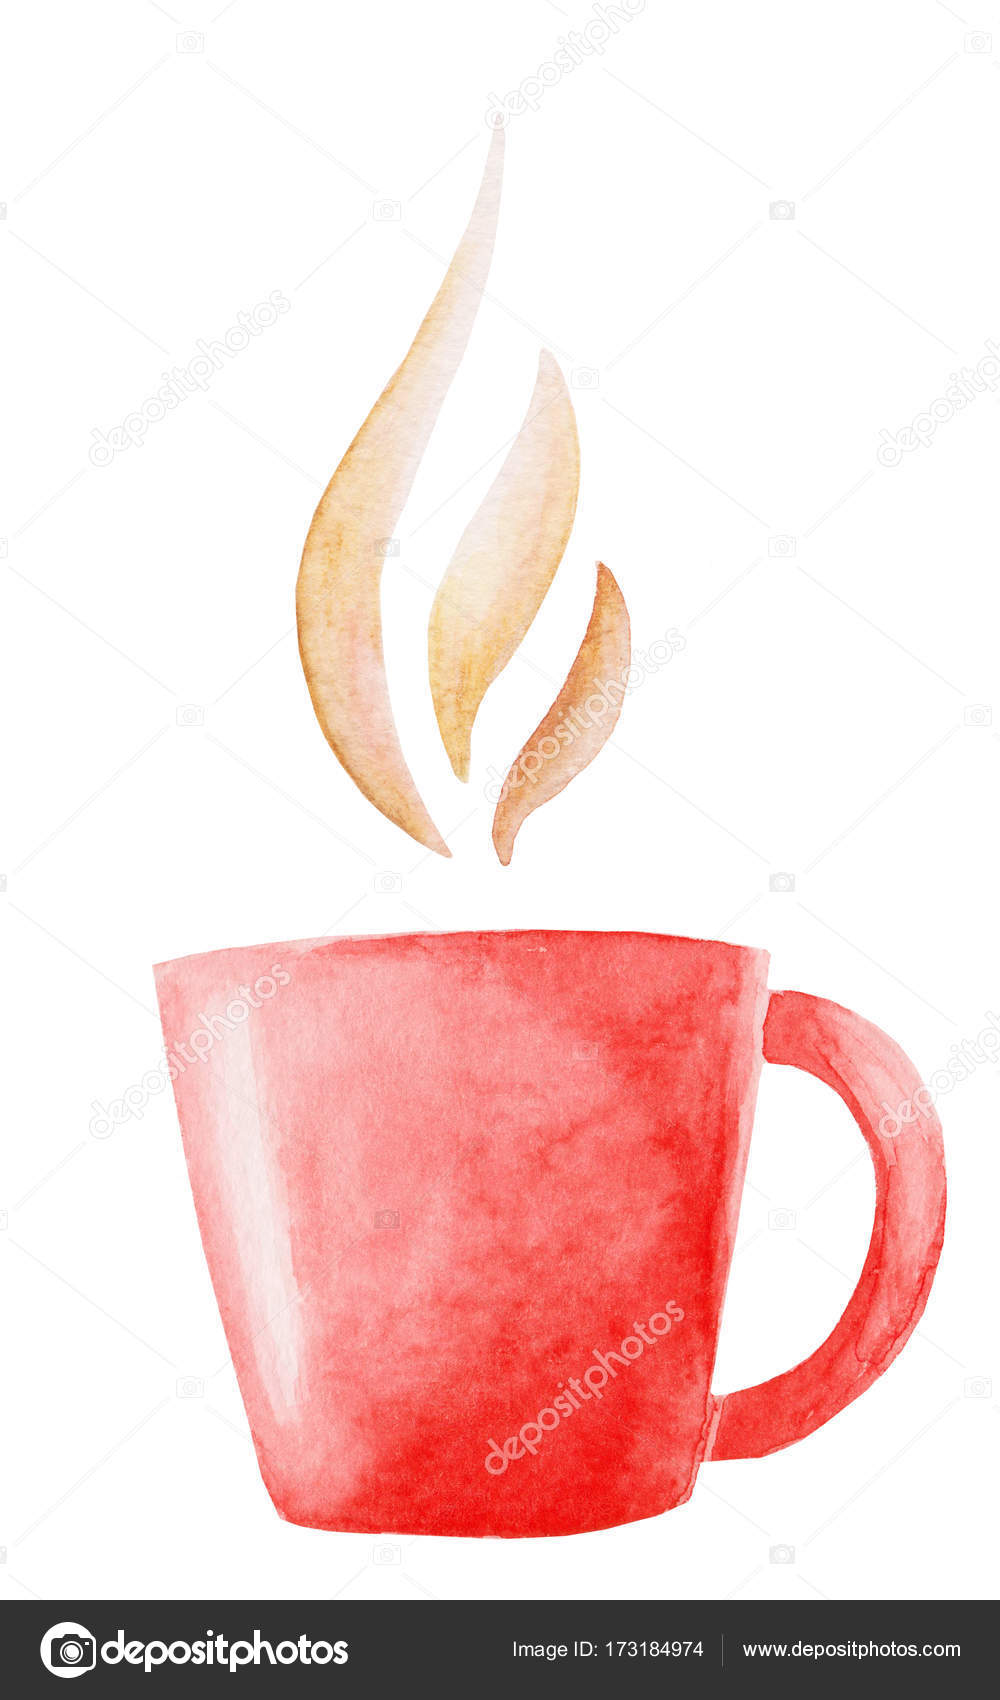 Watercolor Coffee Mug Illustration Isolated Illustration For Design Print Or Background Stock Photo Image By C Masanyanka 173184974